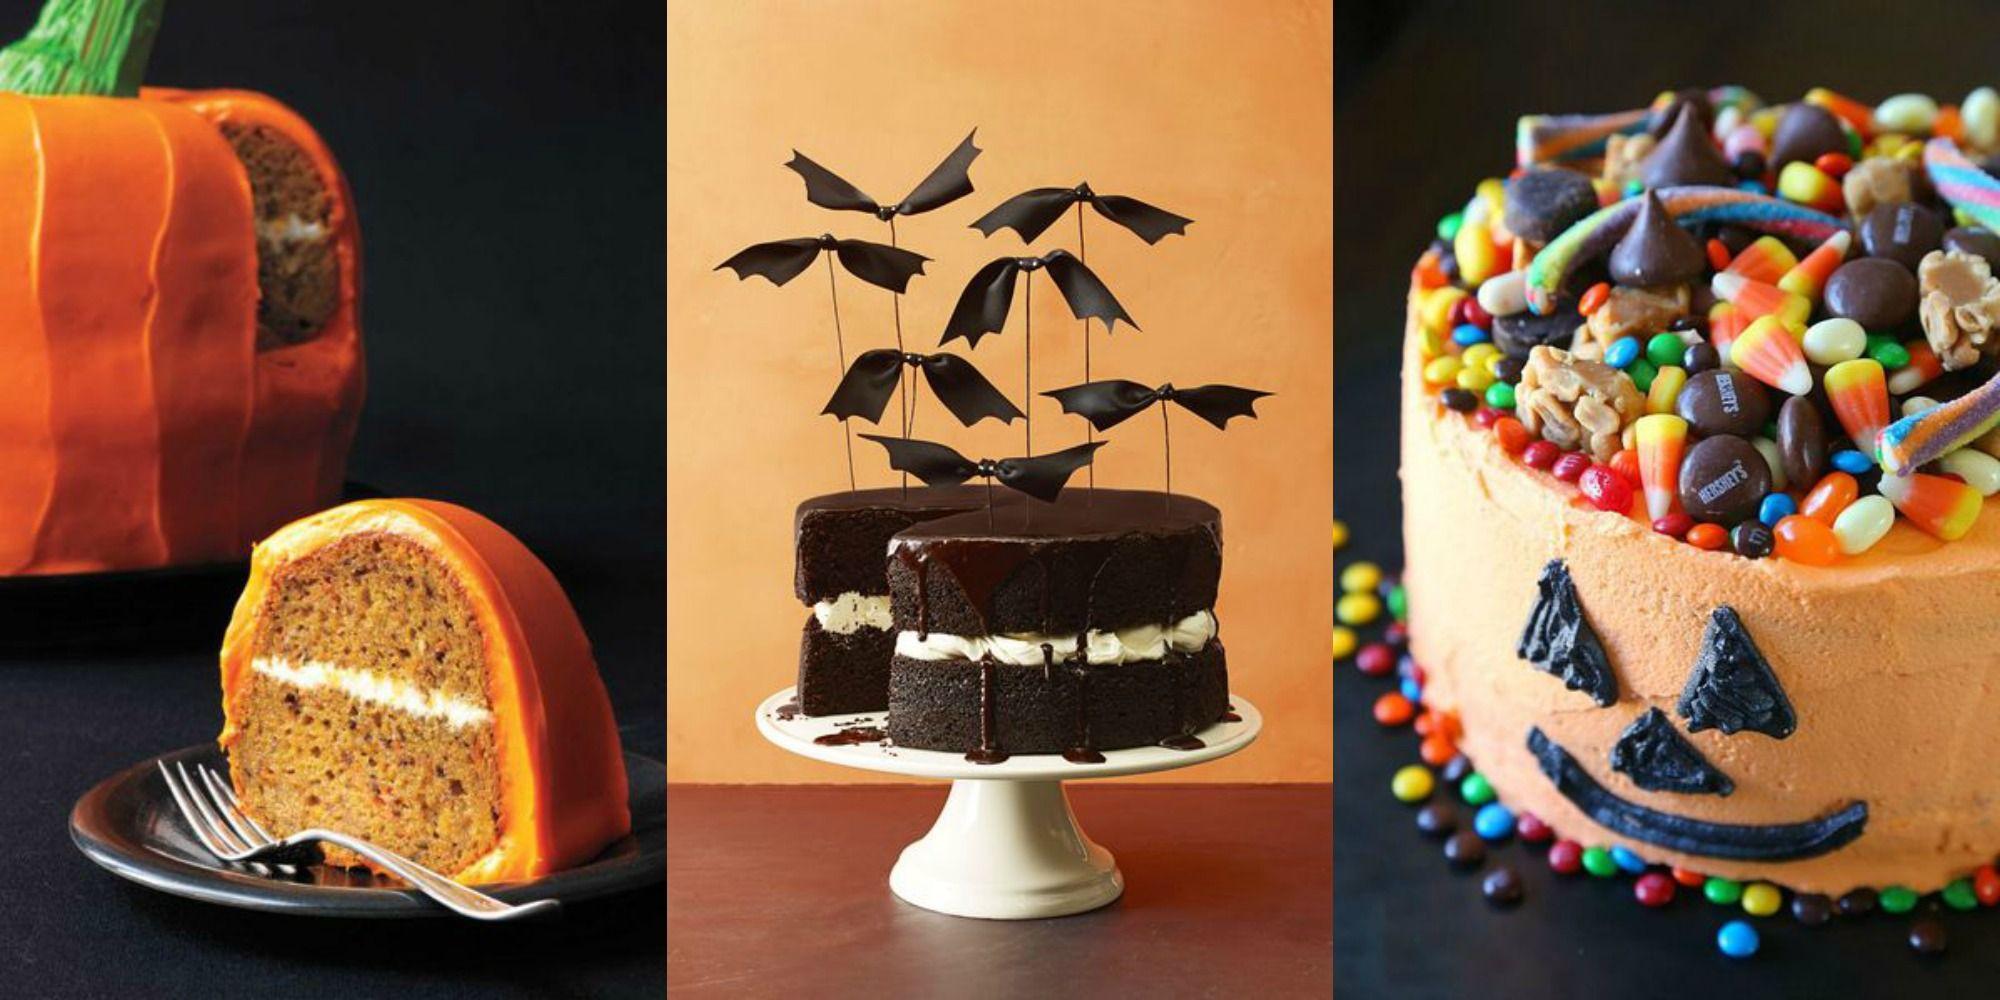 30 spooky halloween cakes - easy halloween cake ideas